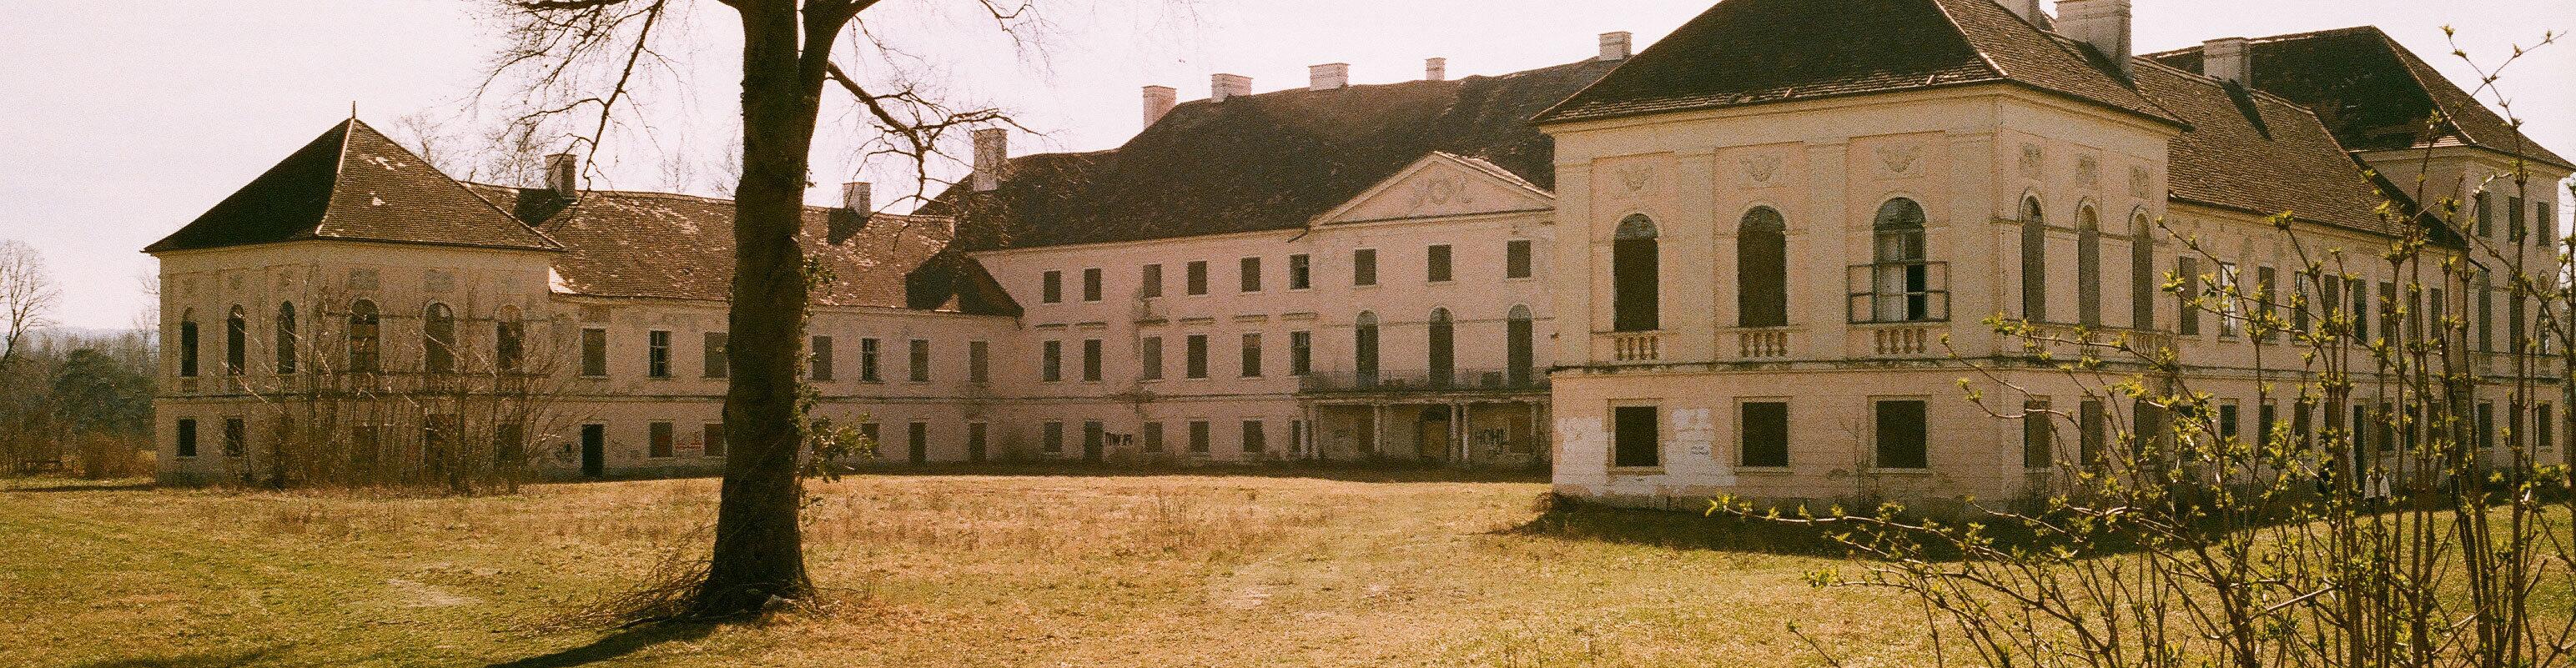 Schloss cover